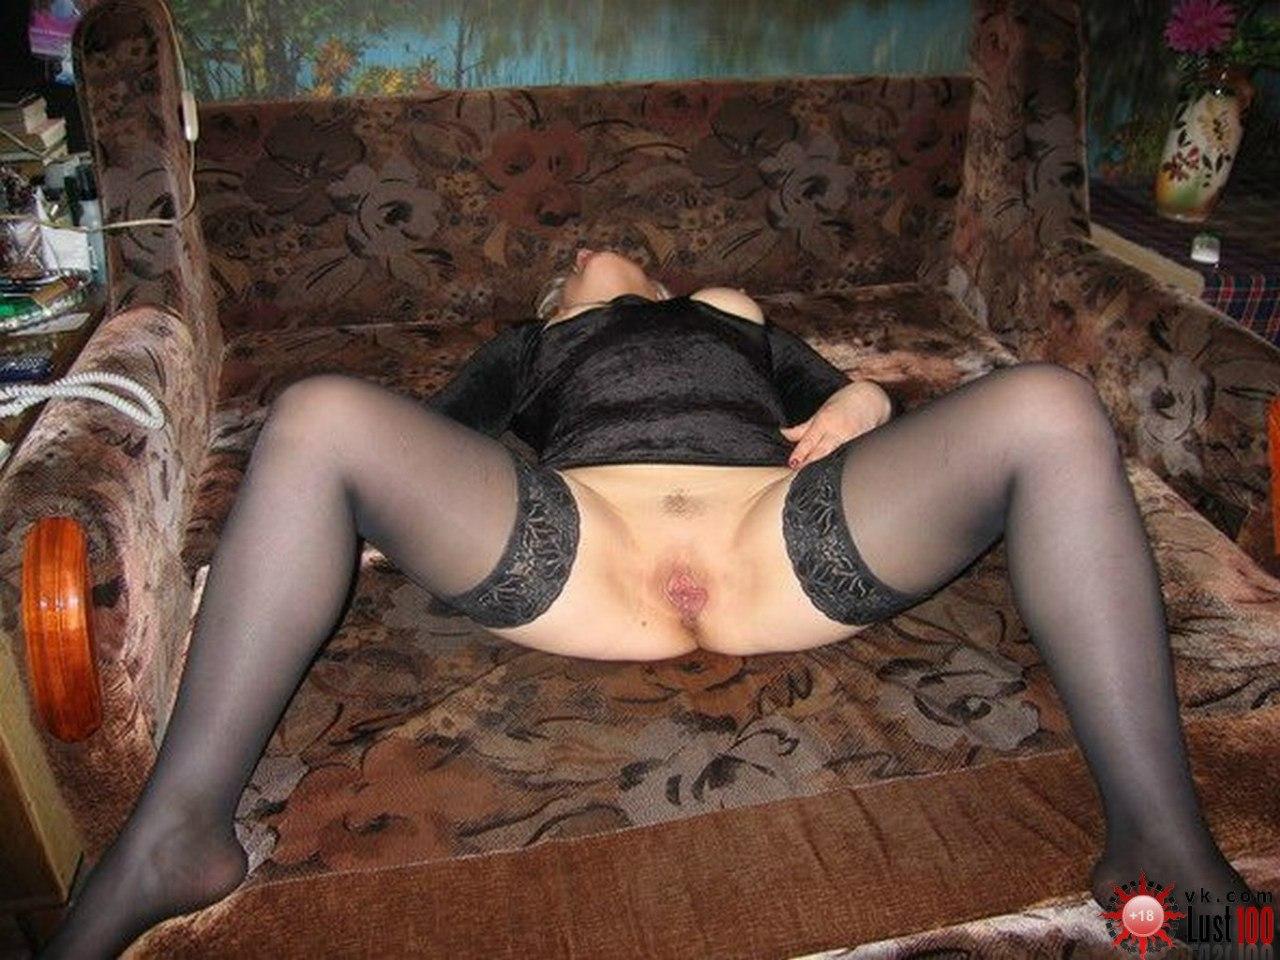 Порно фото в чулках онлайн 2 фотография